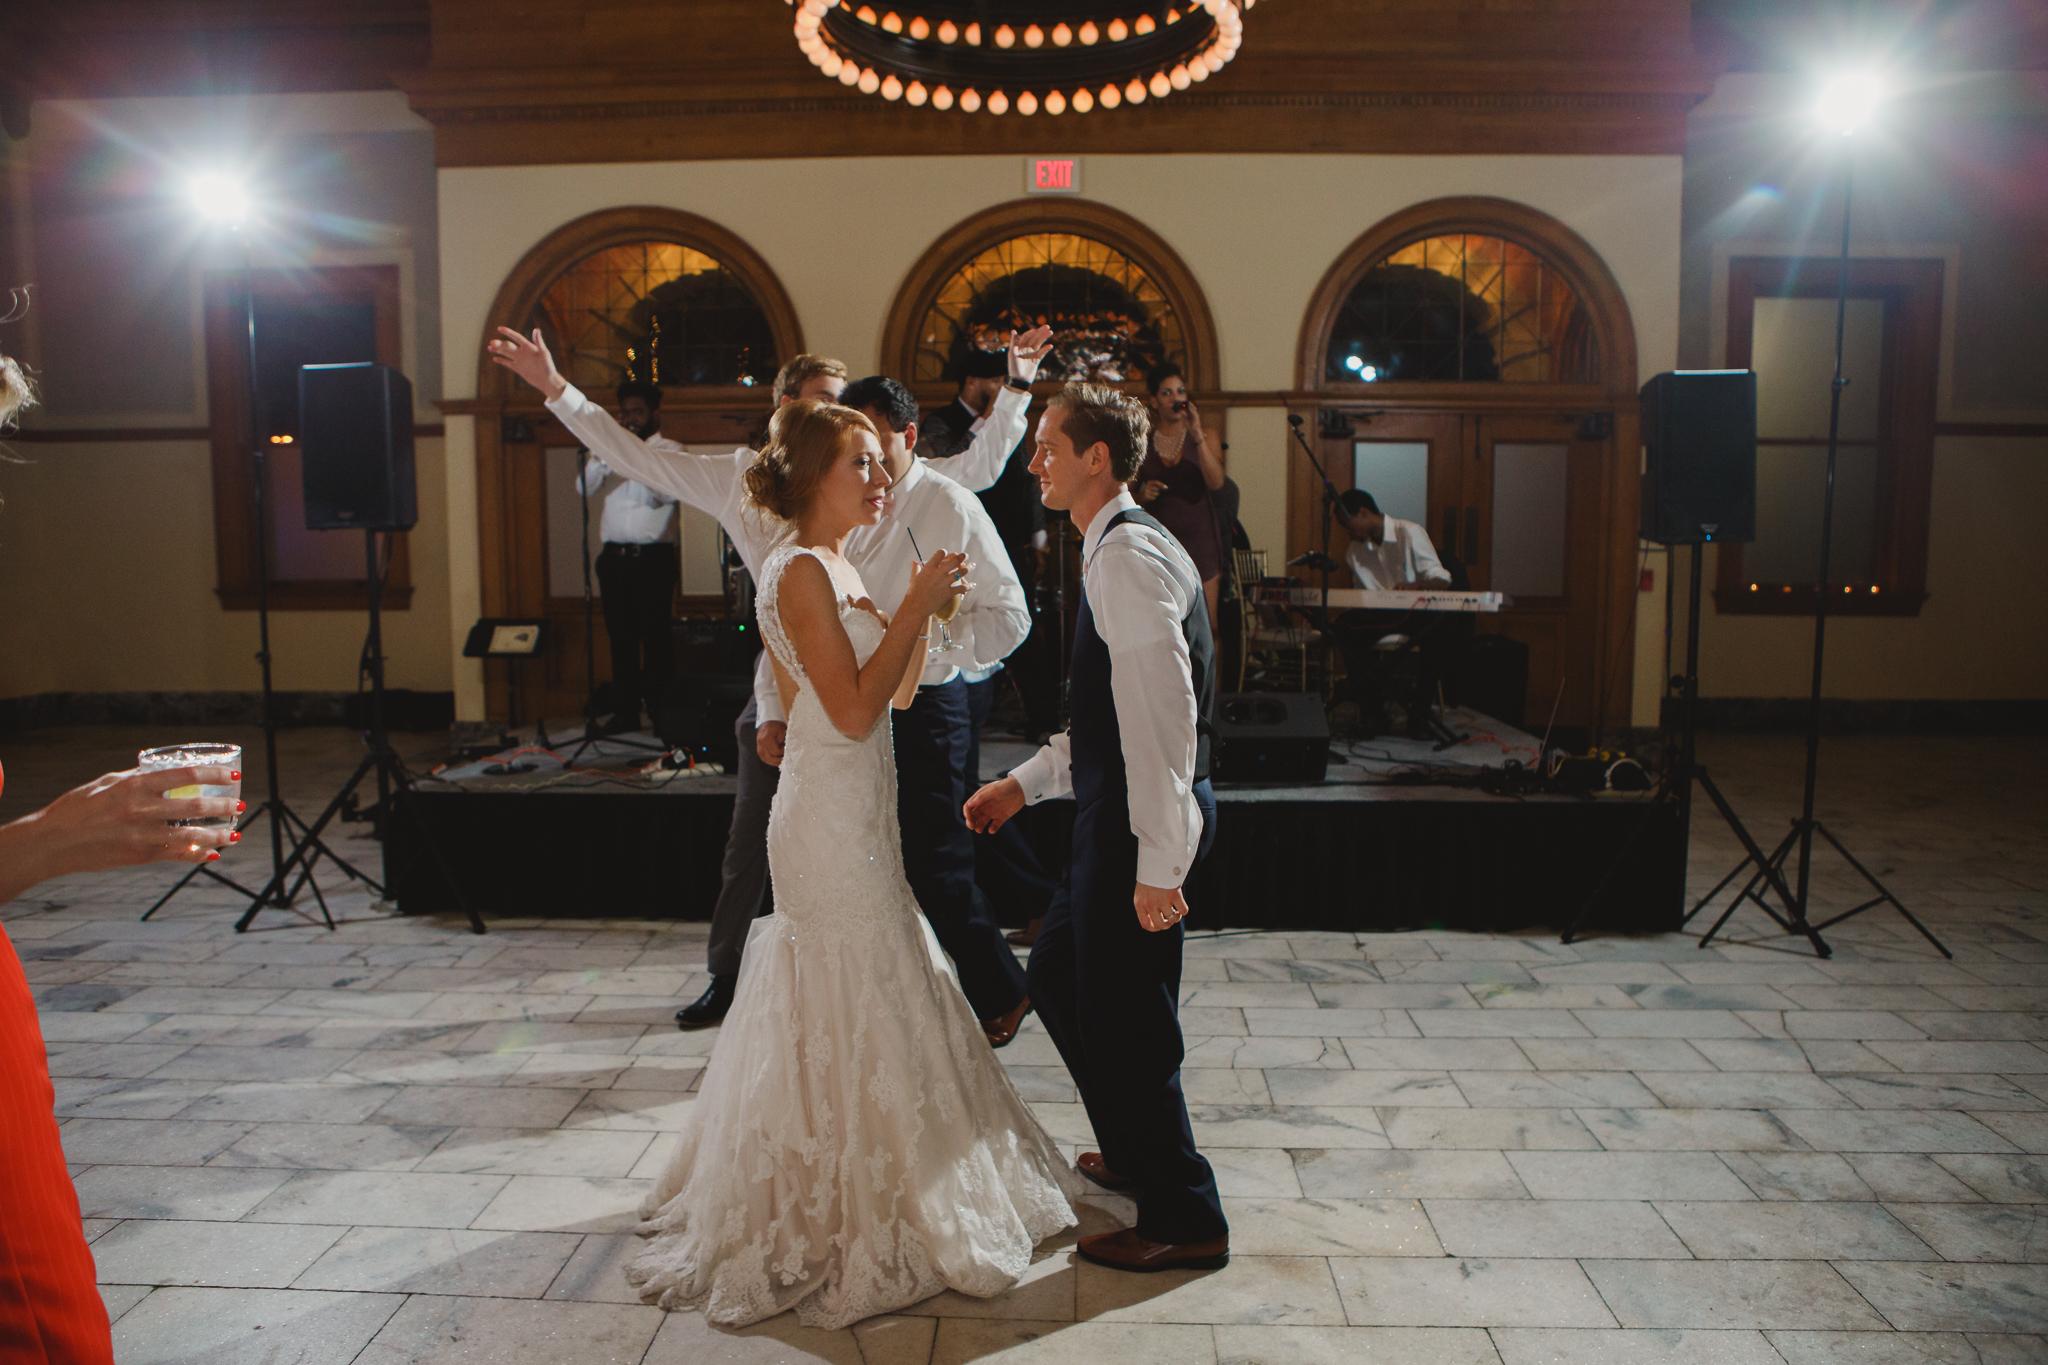 Michael and Kelly - the ashton depot - wedding DFW - wedding photographer- elizalde photography (142 of 150).jpg